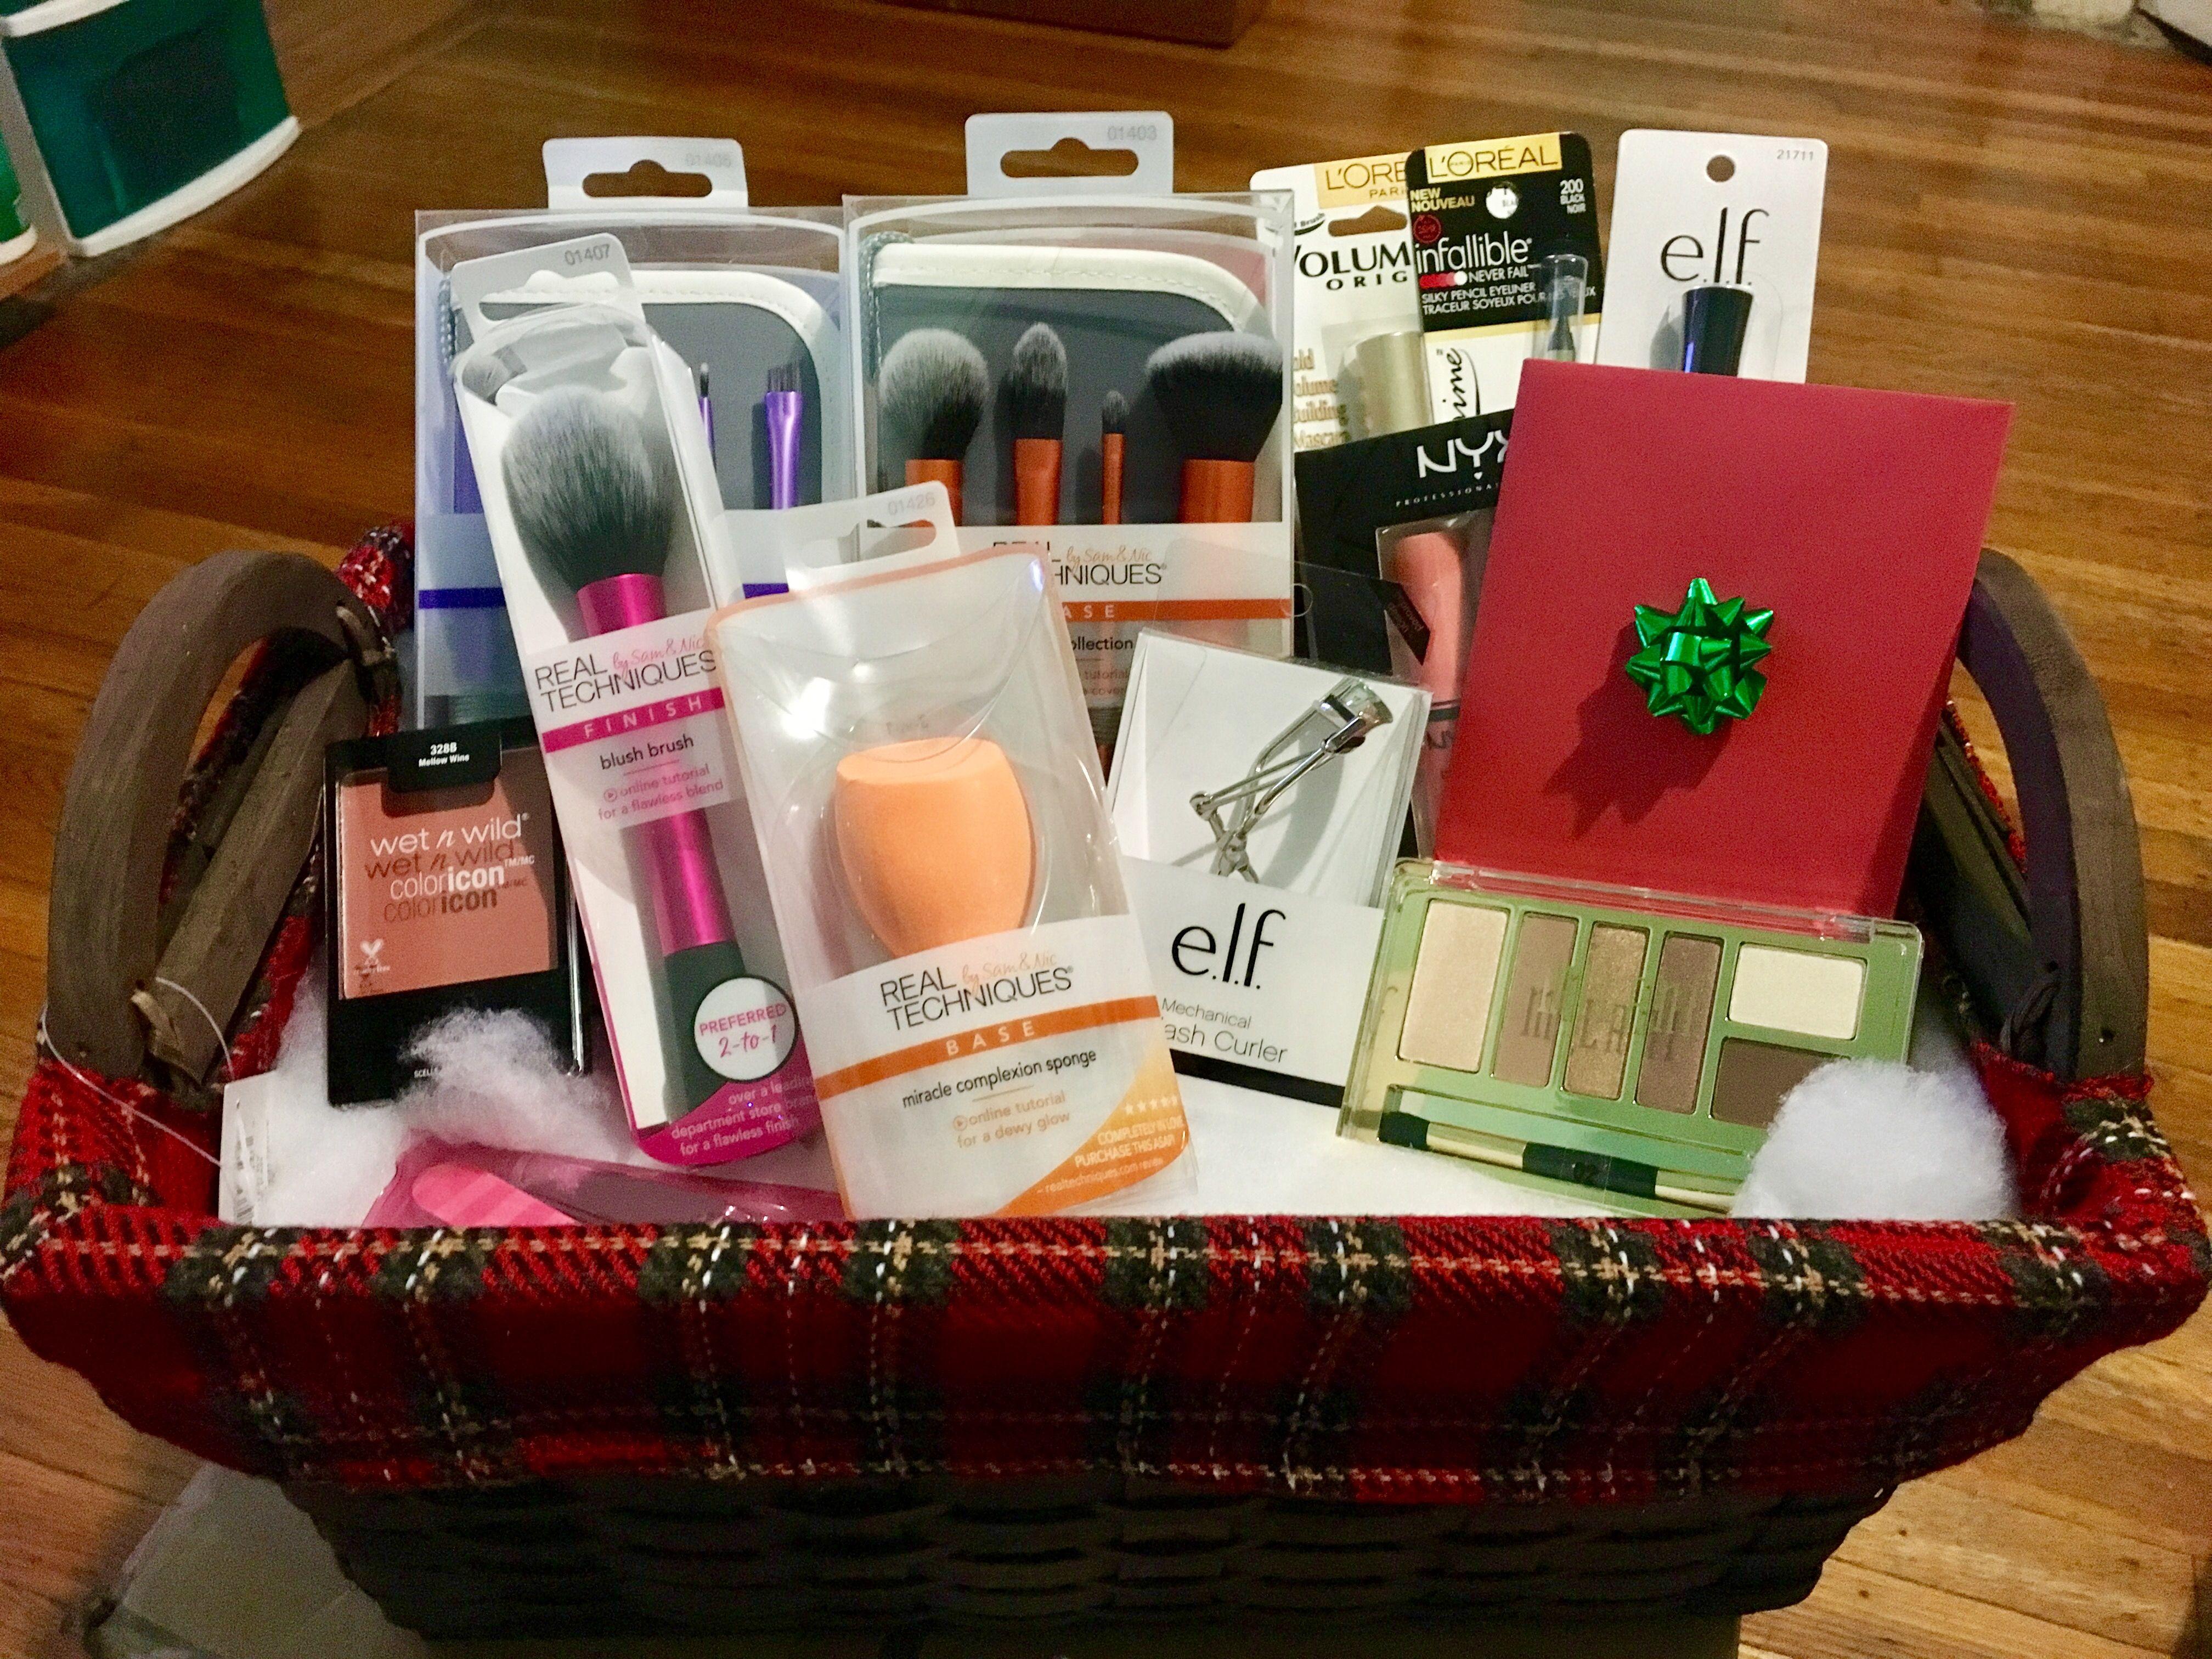 Makeup Lovers Gift Basket Makeup Gifts Basket Gifts For Makeup Lovers Birthday Gift Baskets